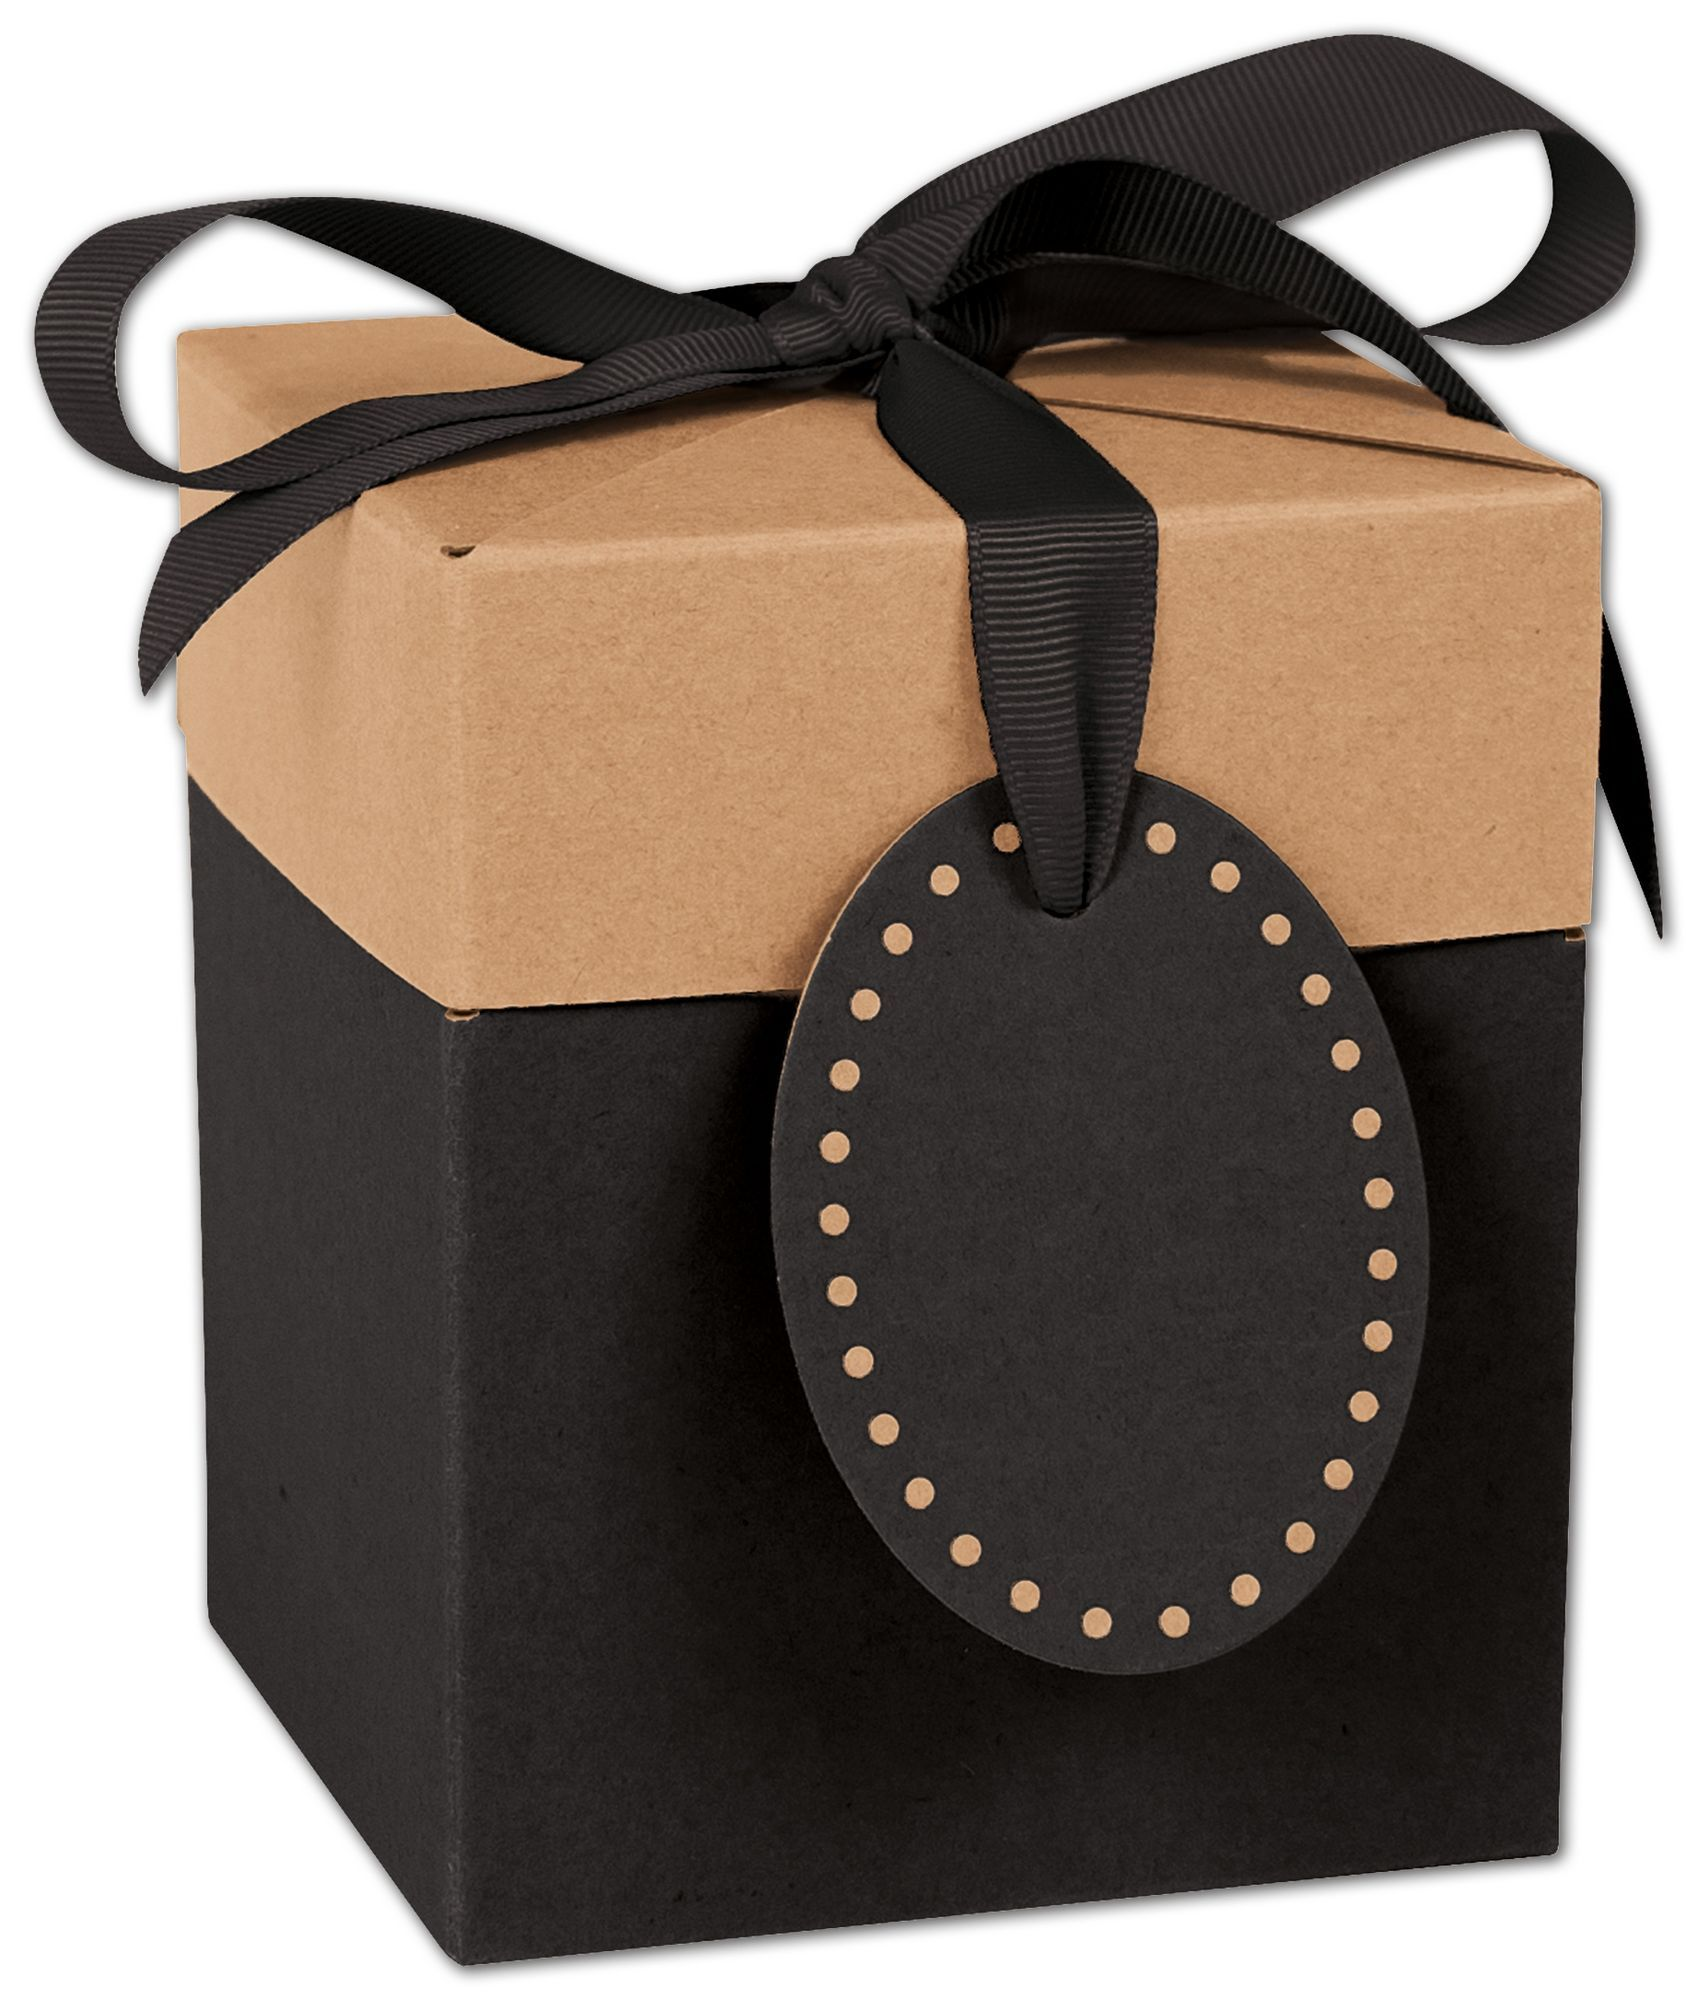 Black kraft giftalicious popup boxes 4 x 4 x 4 34